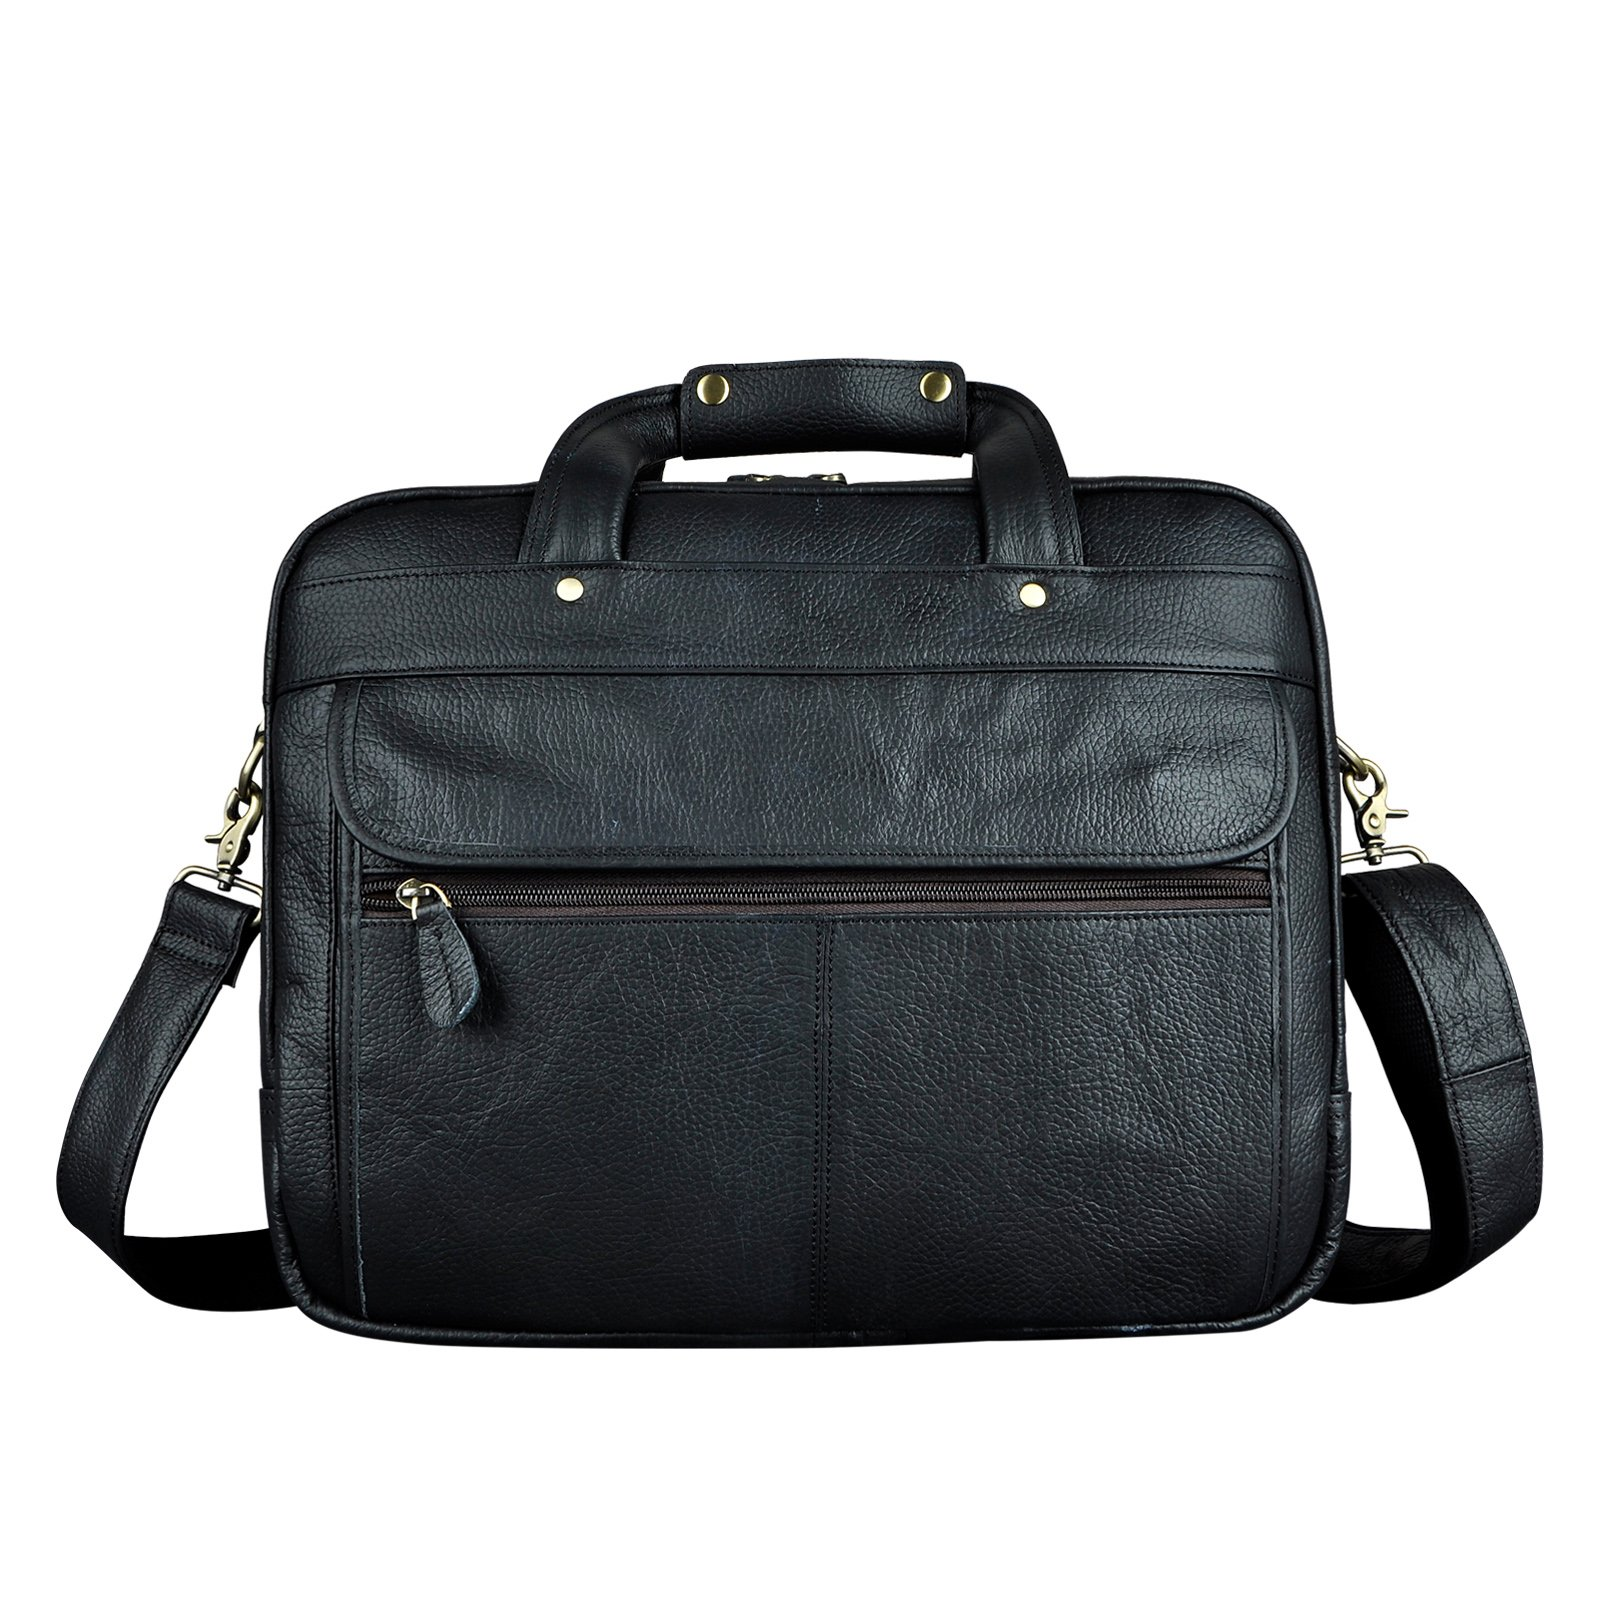 Le'aokuu Leather Mens Business Travel Laptop Case Best Portfolio Briefcase Handles Organizer Shoulder Strap Messenger Bag (Y B1001 Black)